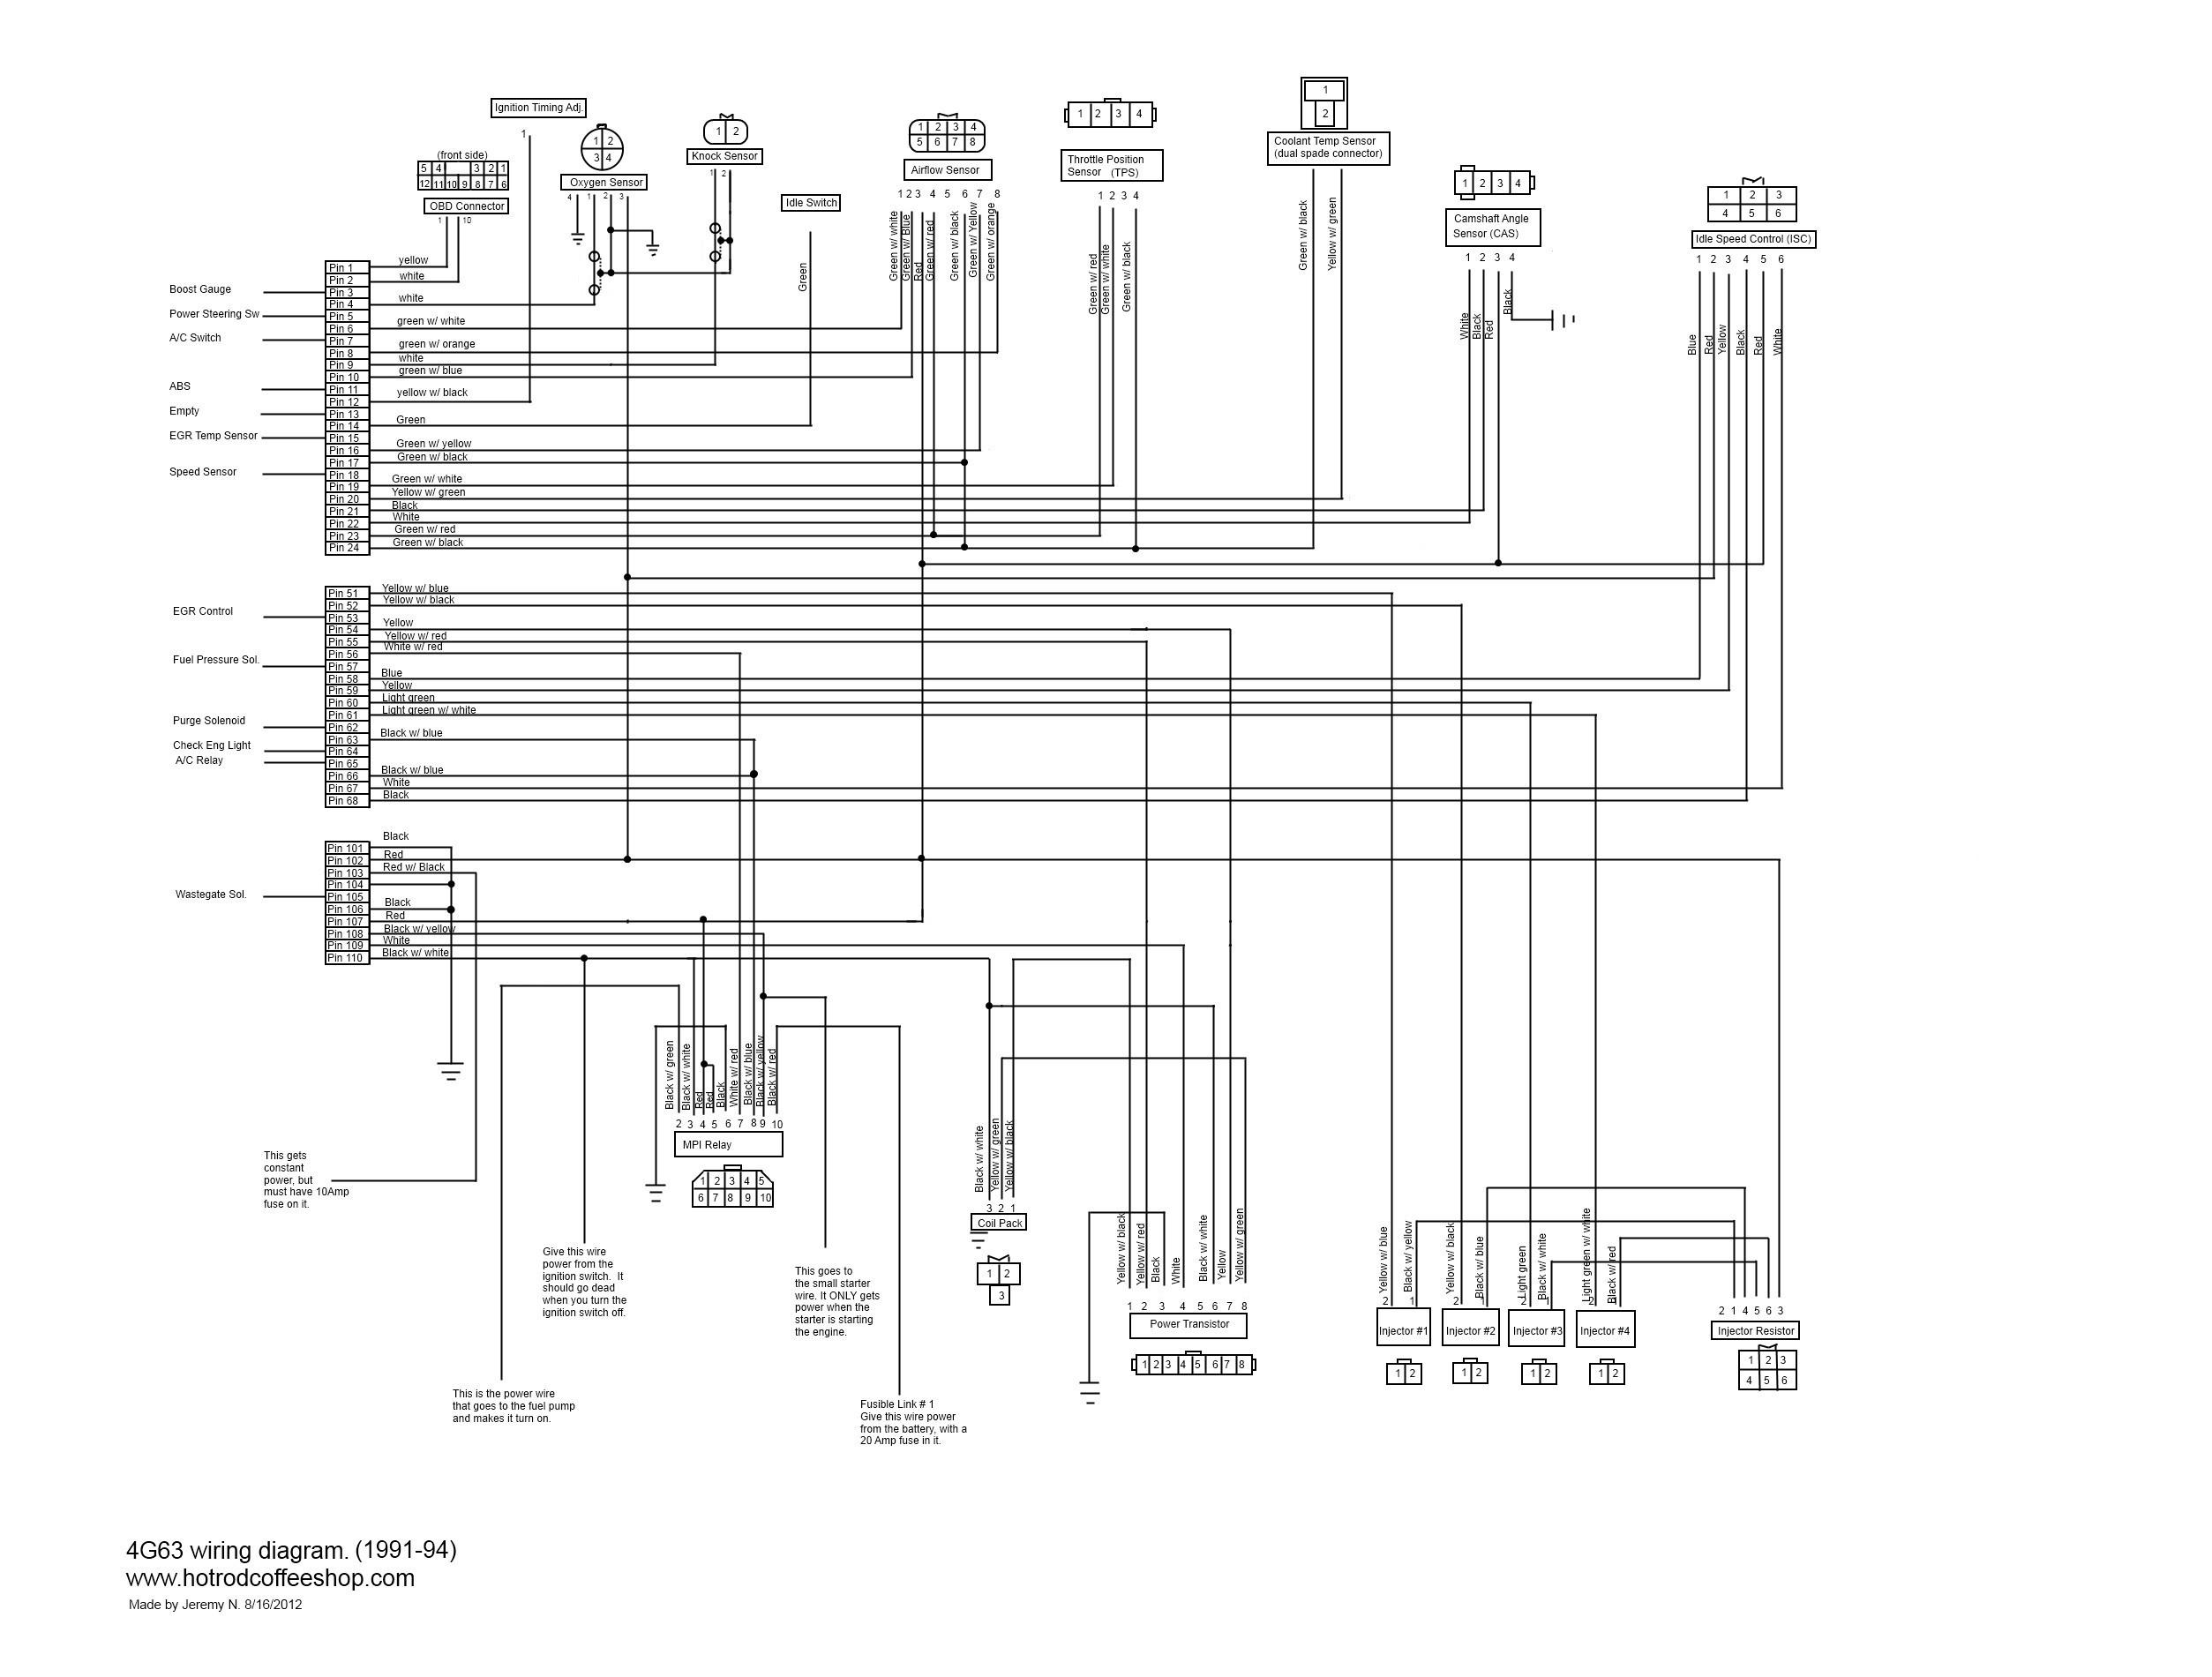 wiring diagram for 2000 mitsubishi galant